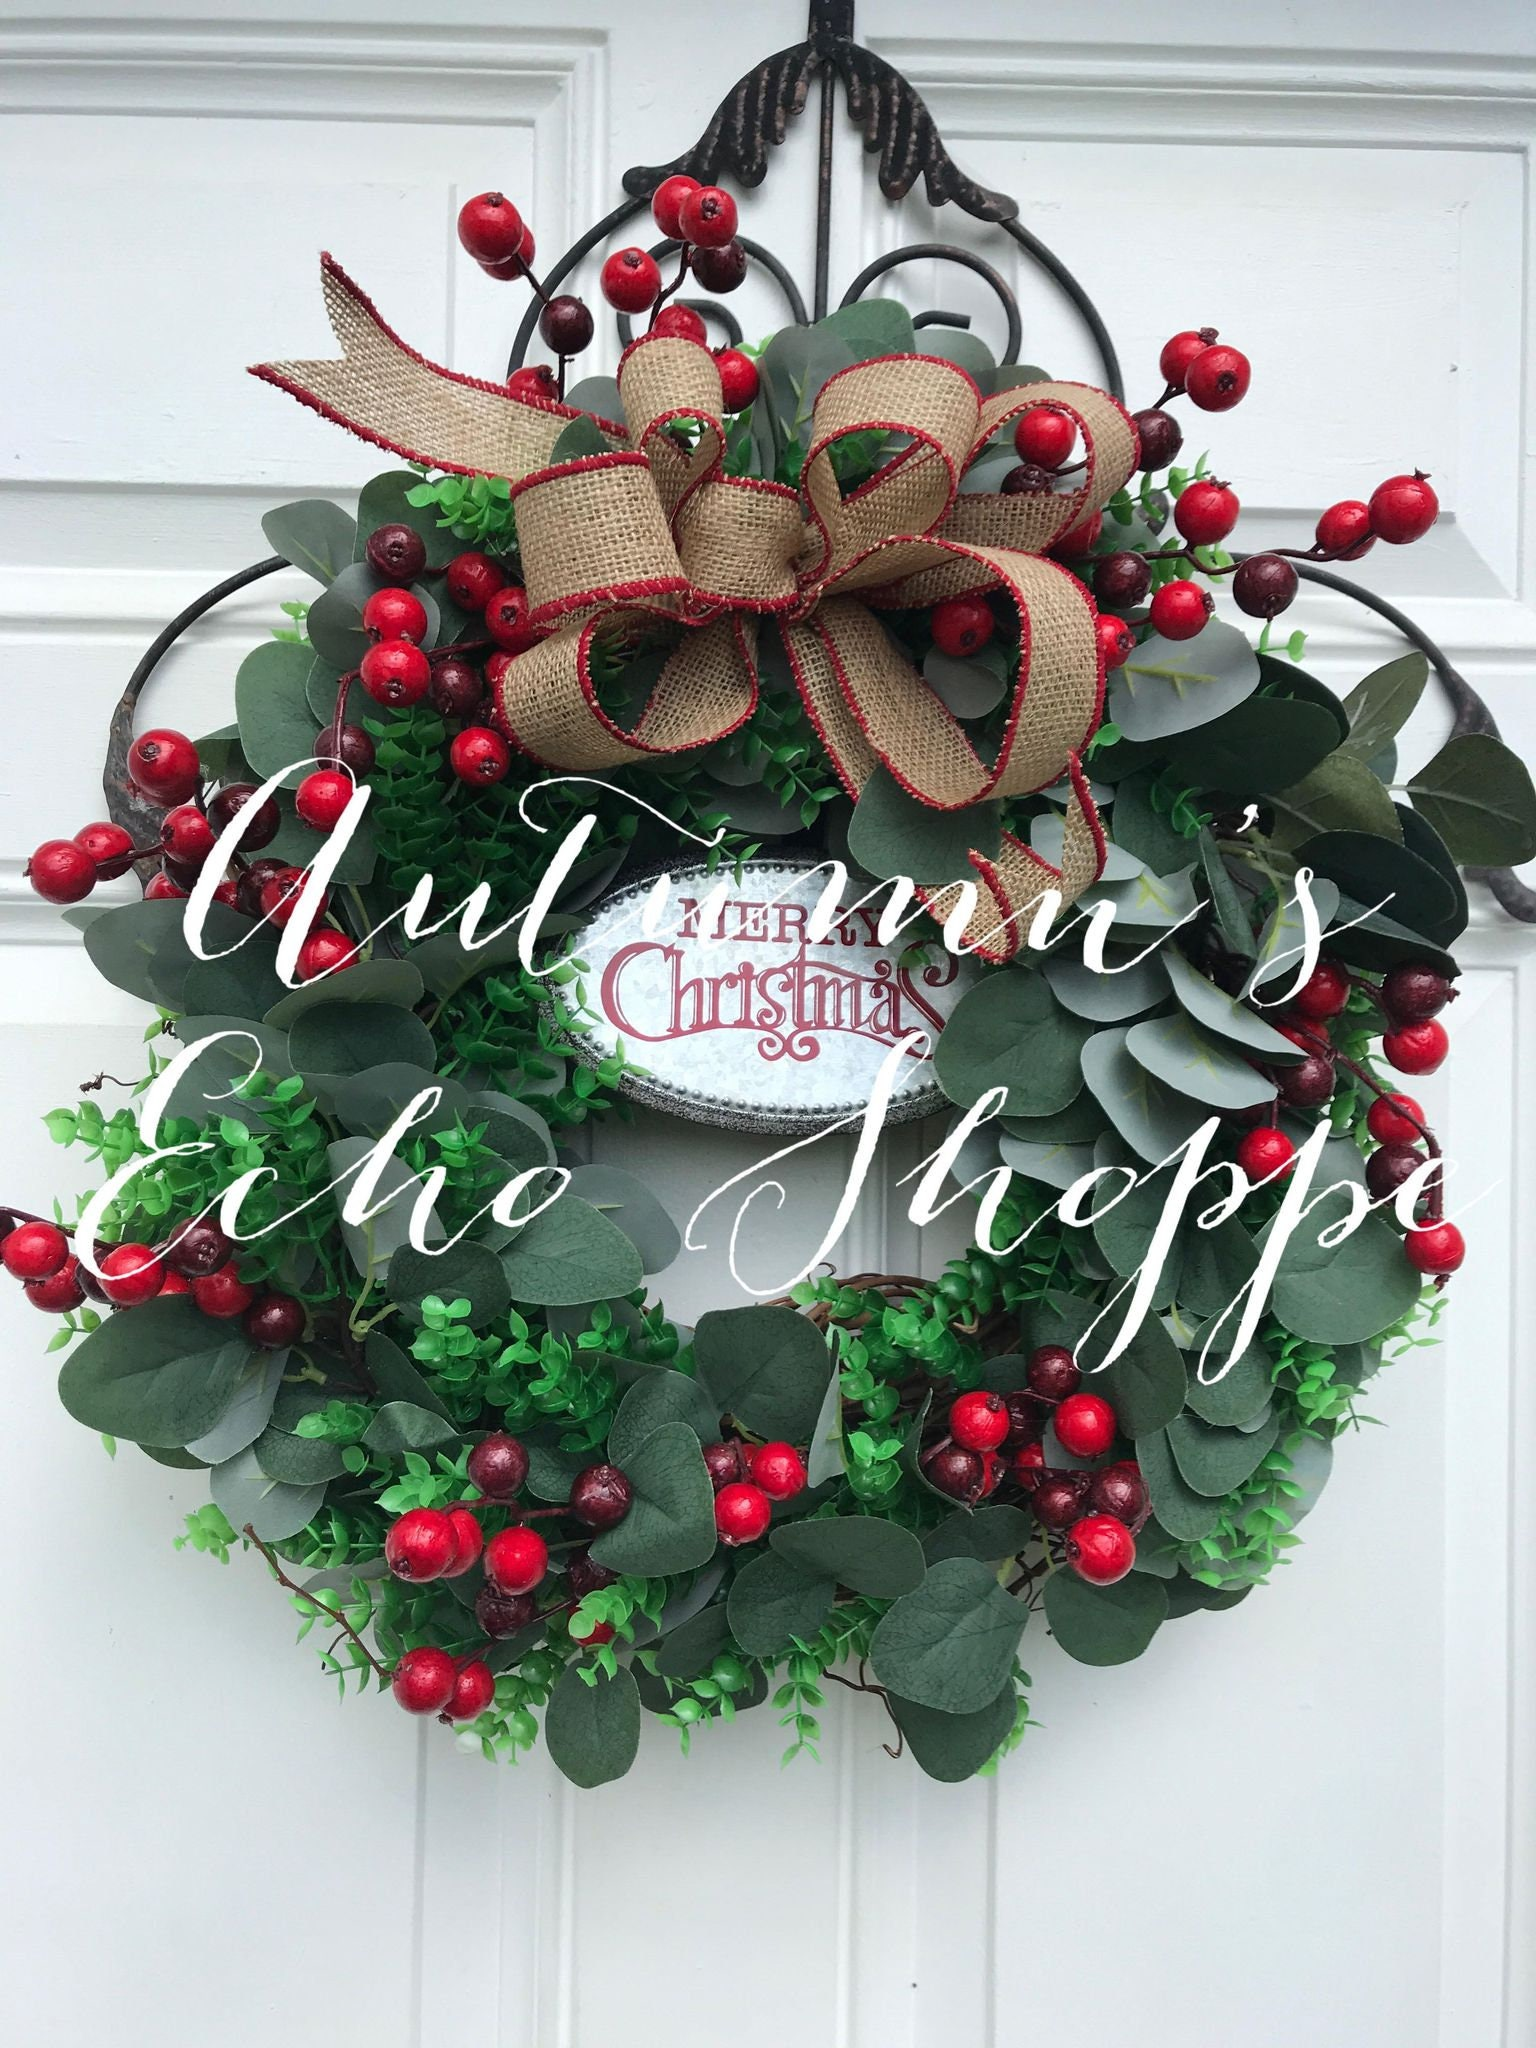 Eucalyptus Christmas Wreath Eucalyptus Boxwood And Berry Wreath Holiday Door Wreath Christmas Wreath Red And Green Classic Wreath